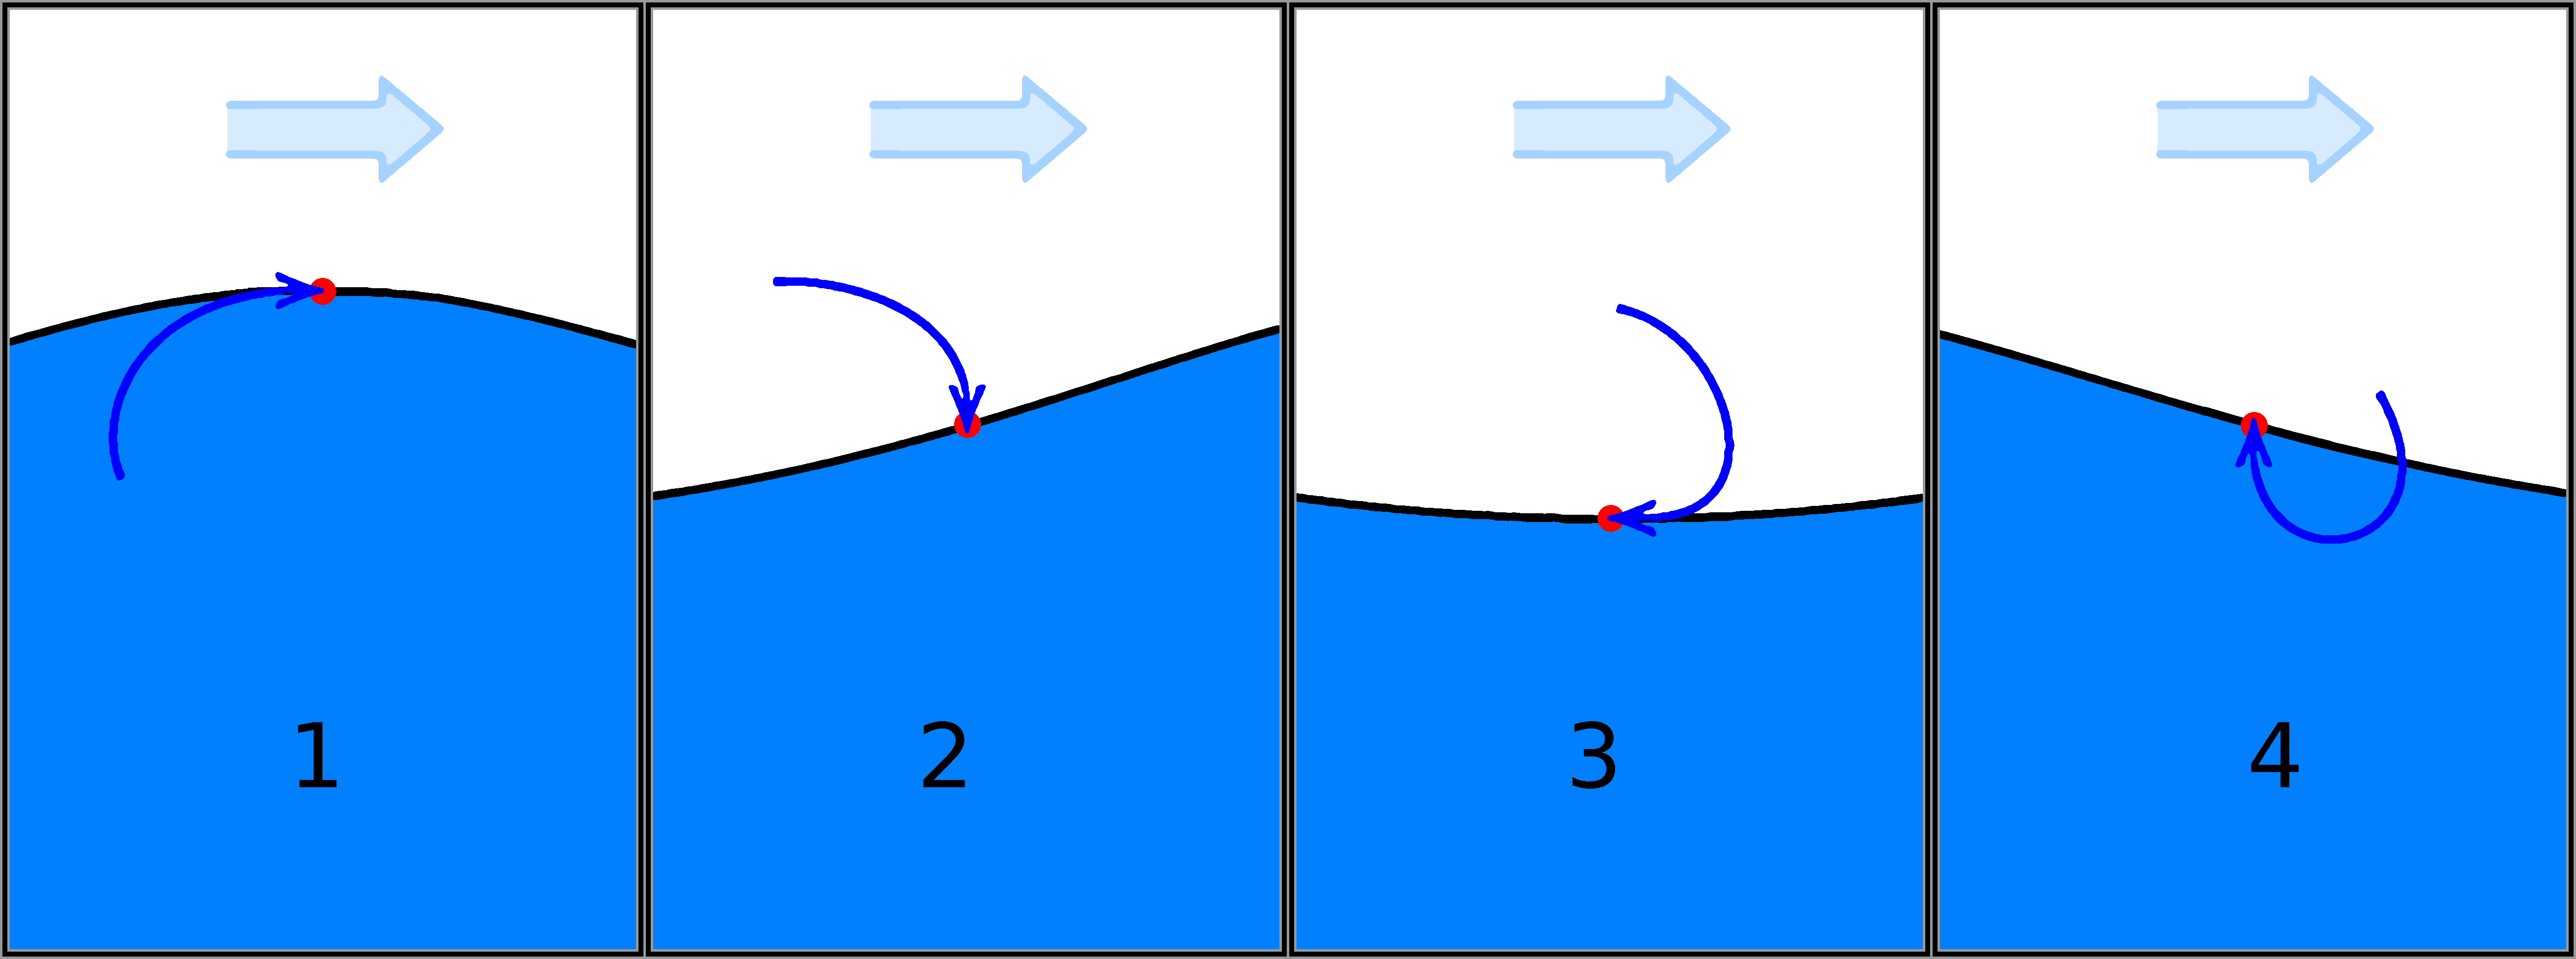 Bølgehøyde måling